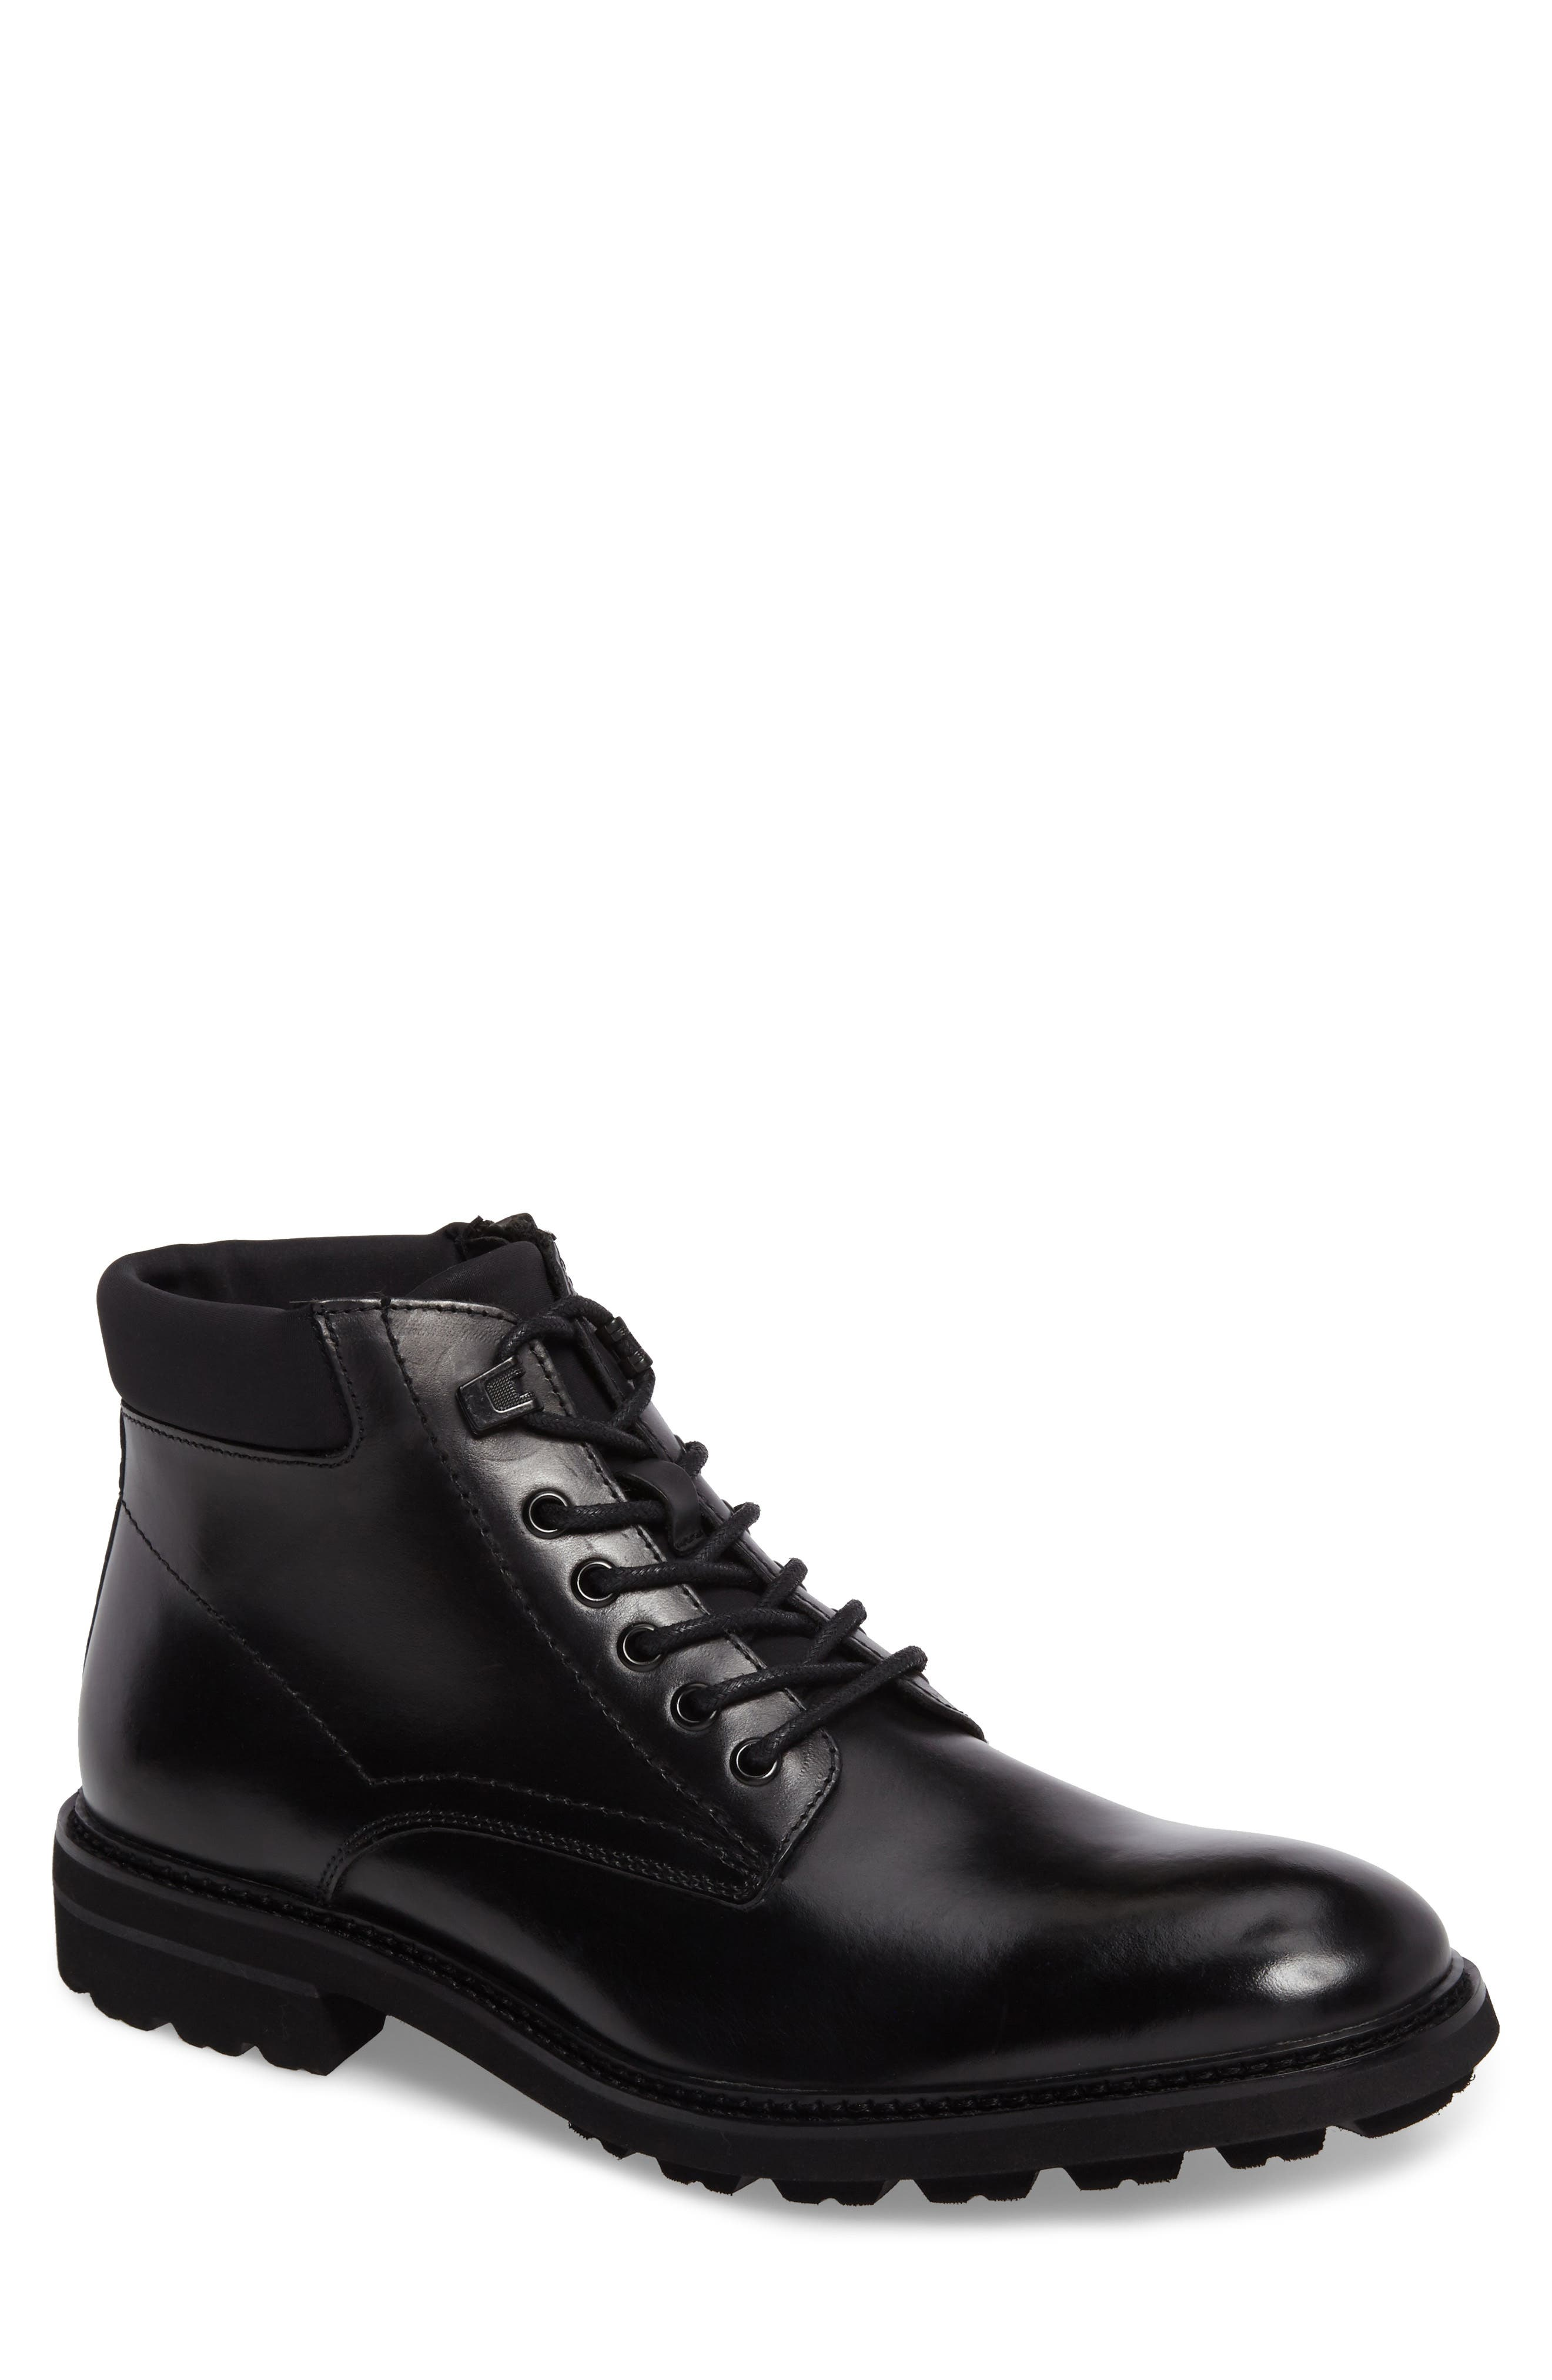 KENNETH COLE NEW YORK Plain Toe Boot